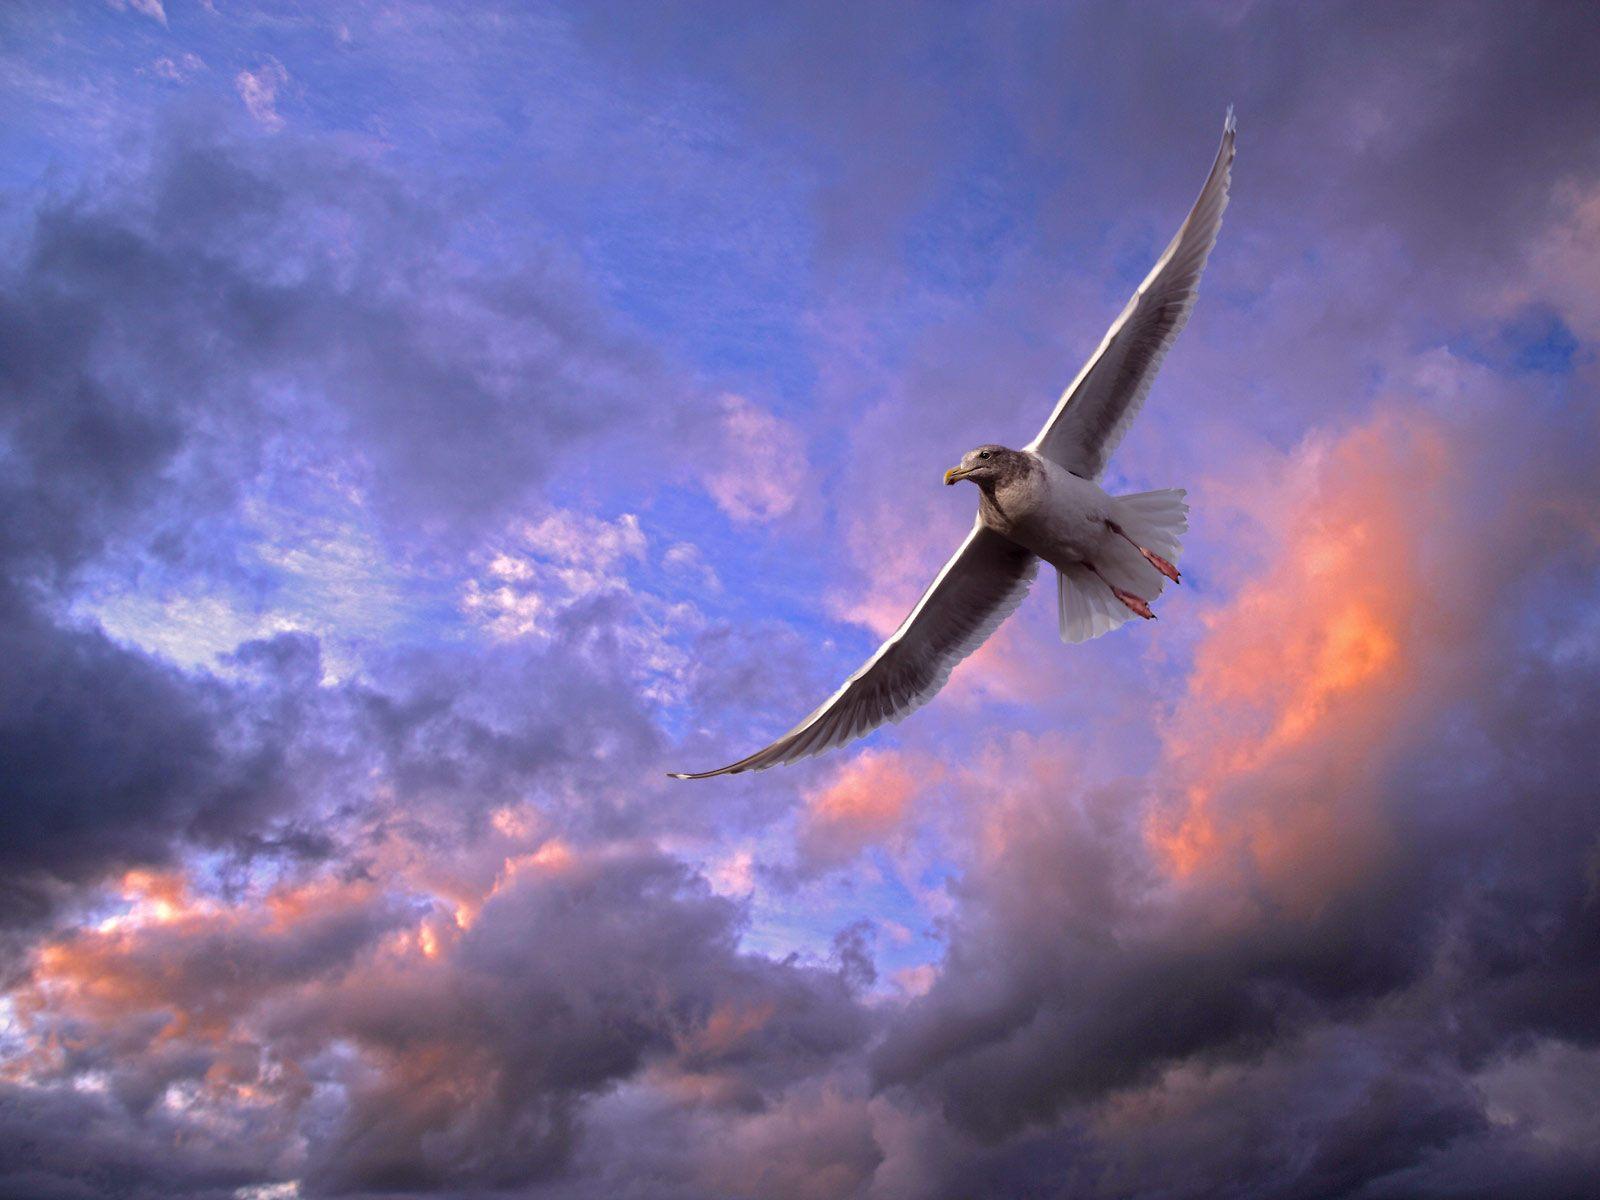 Wallpapers Hd Flying Birds Apple Animals Blue Sky Desktop: Wallpaper Collections: Gull Backgrounds